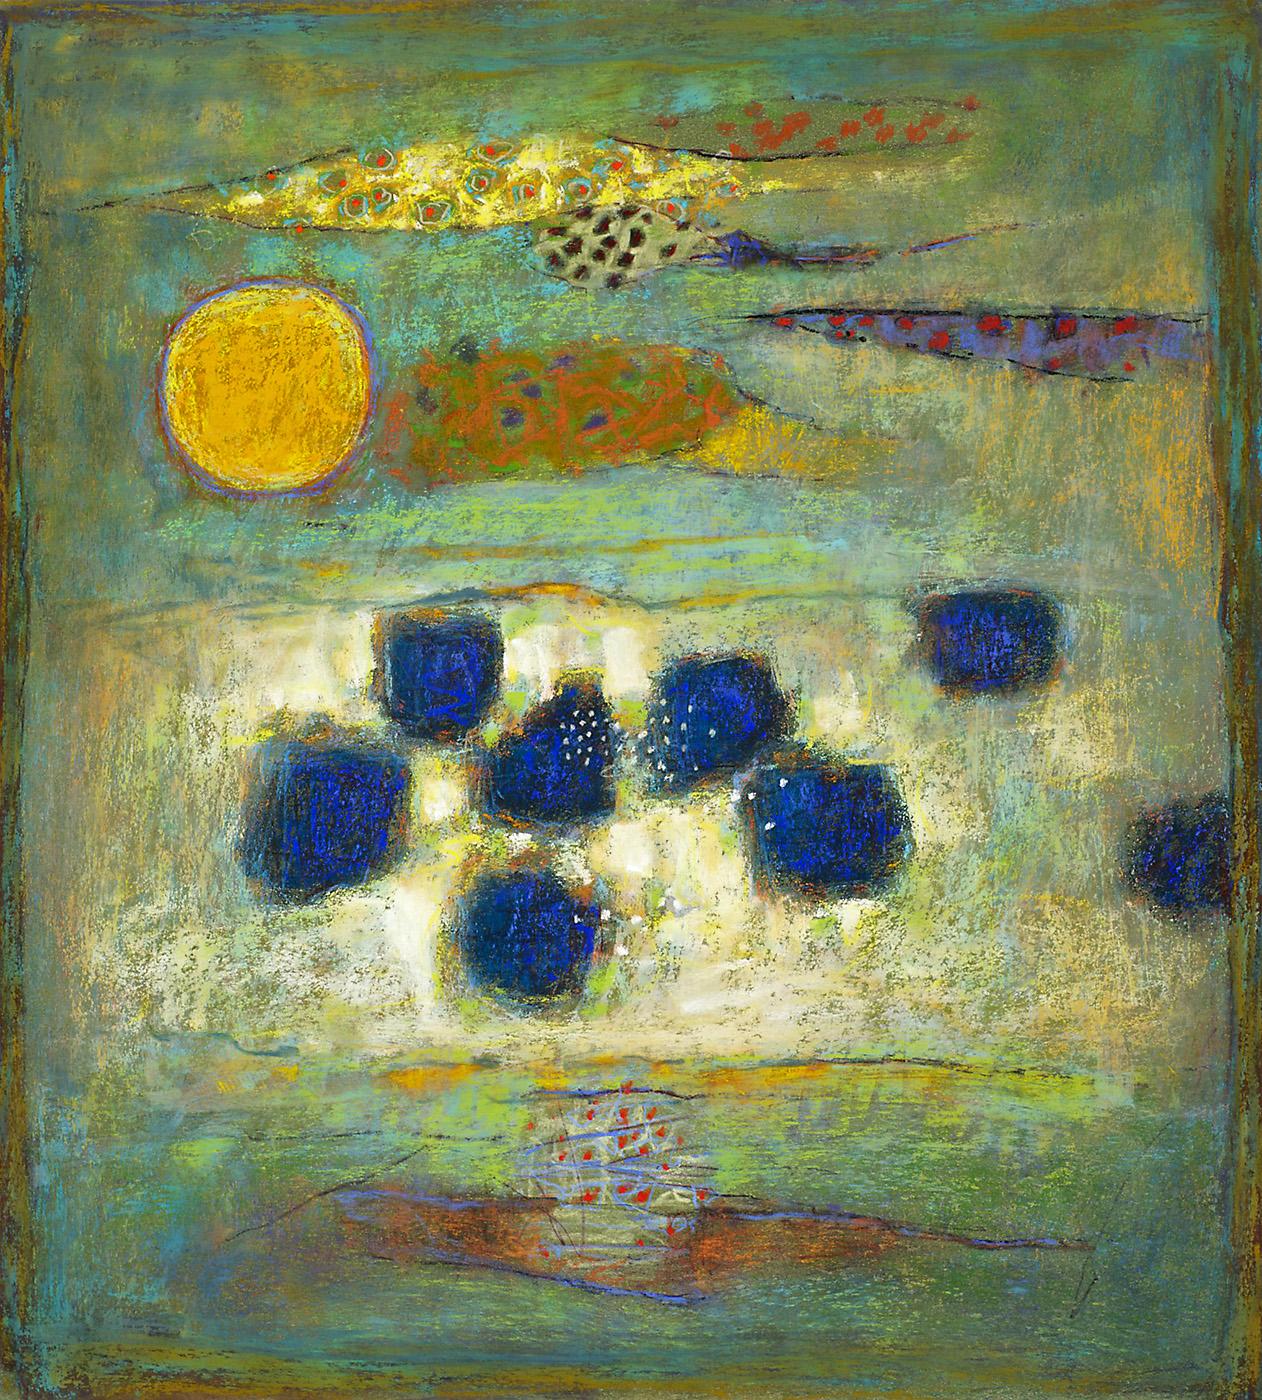 "Beckoning Strata   | pastel on paper | 20 x 18"" | 2013"